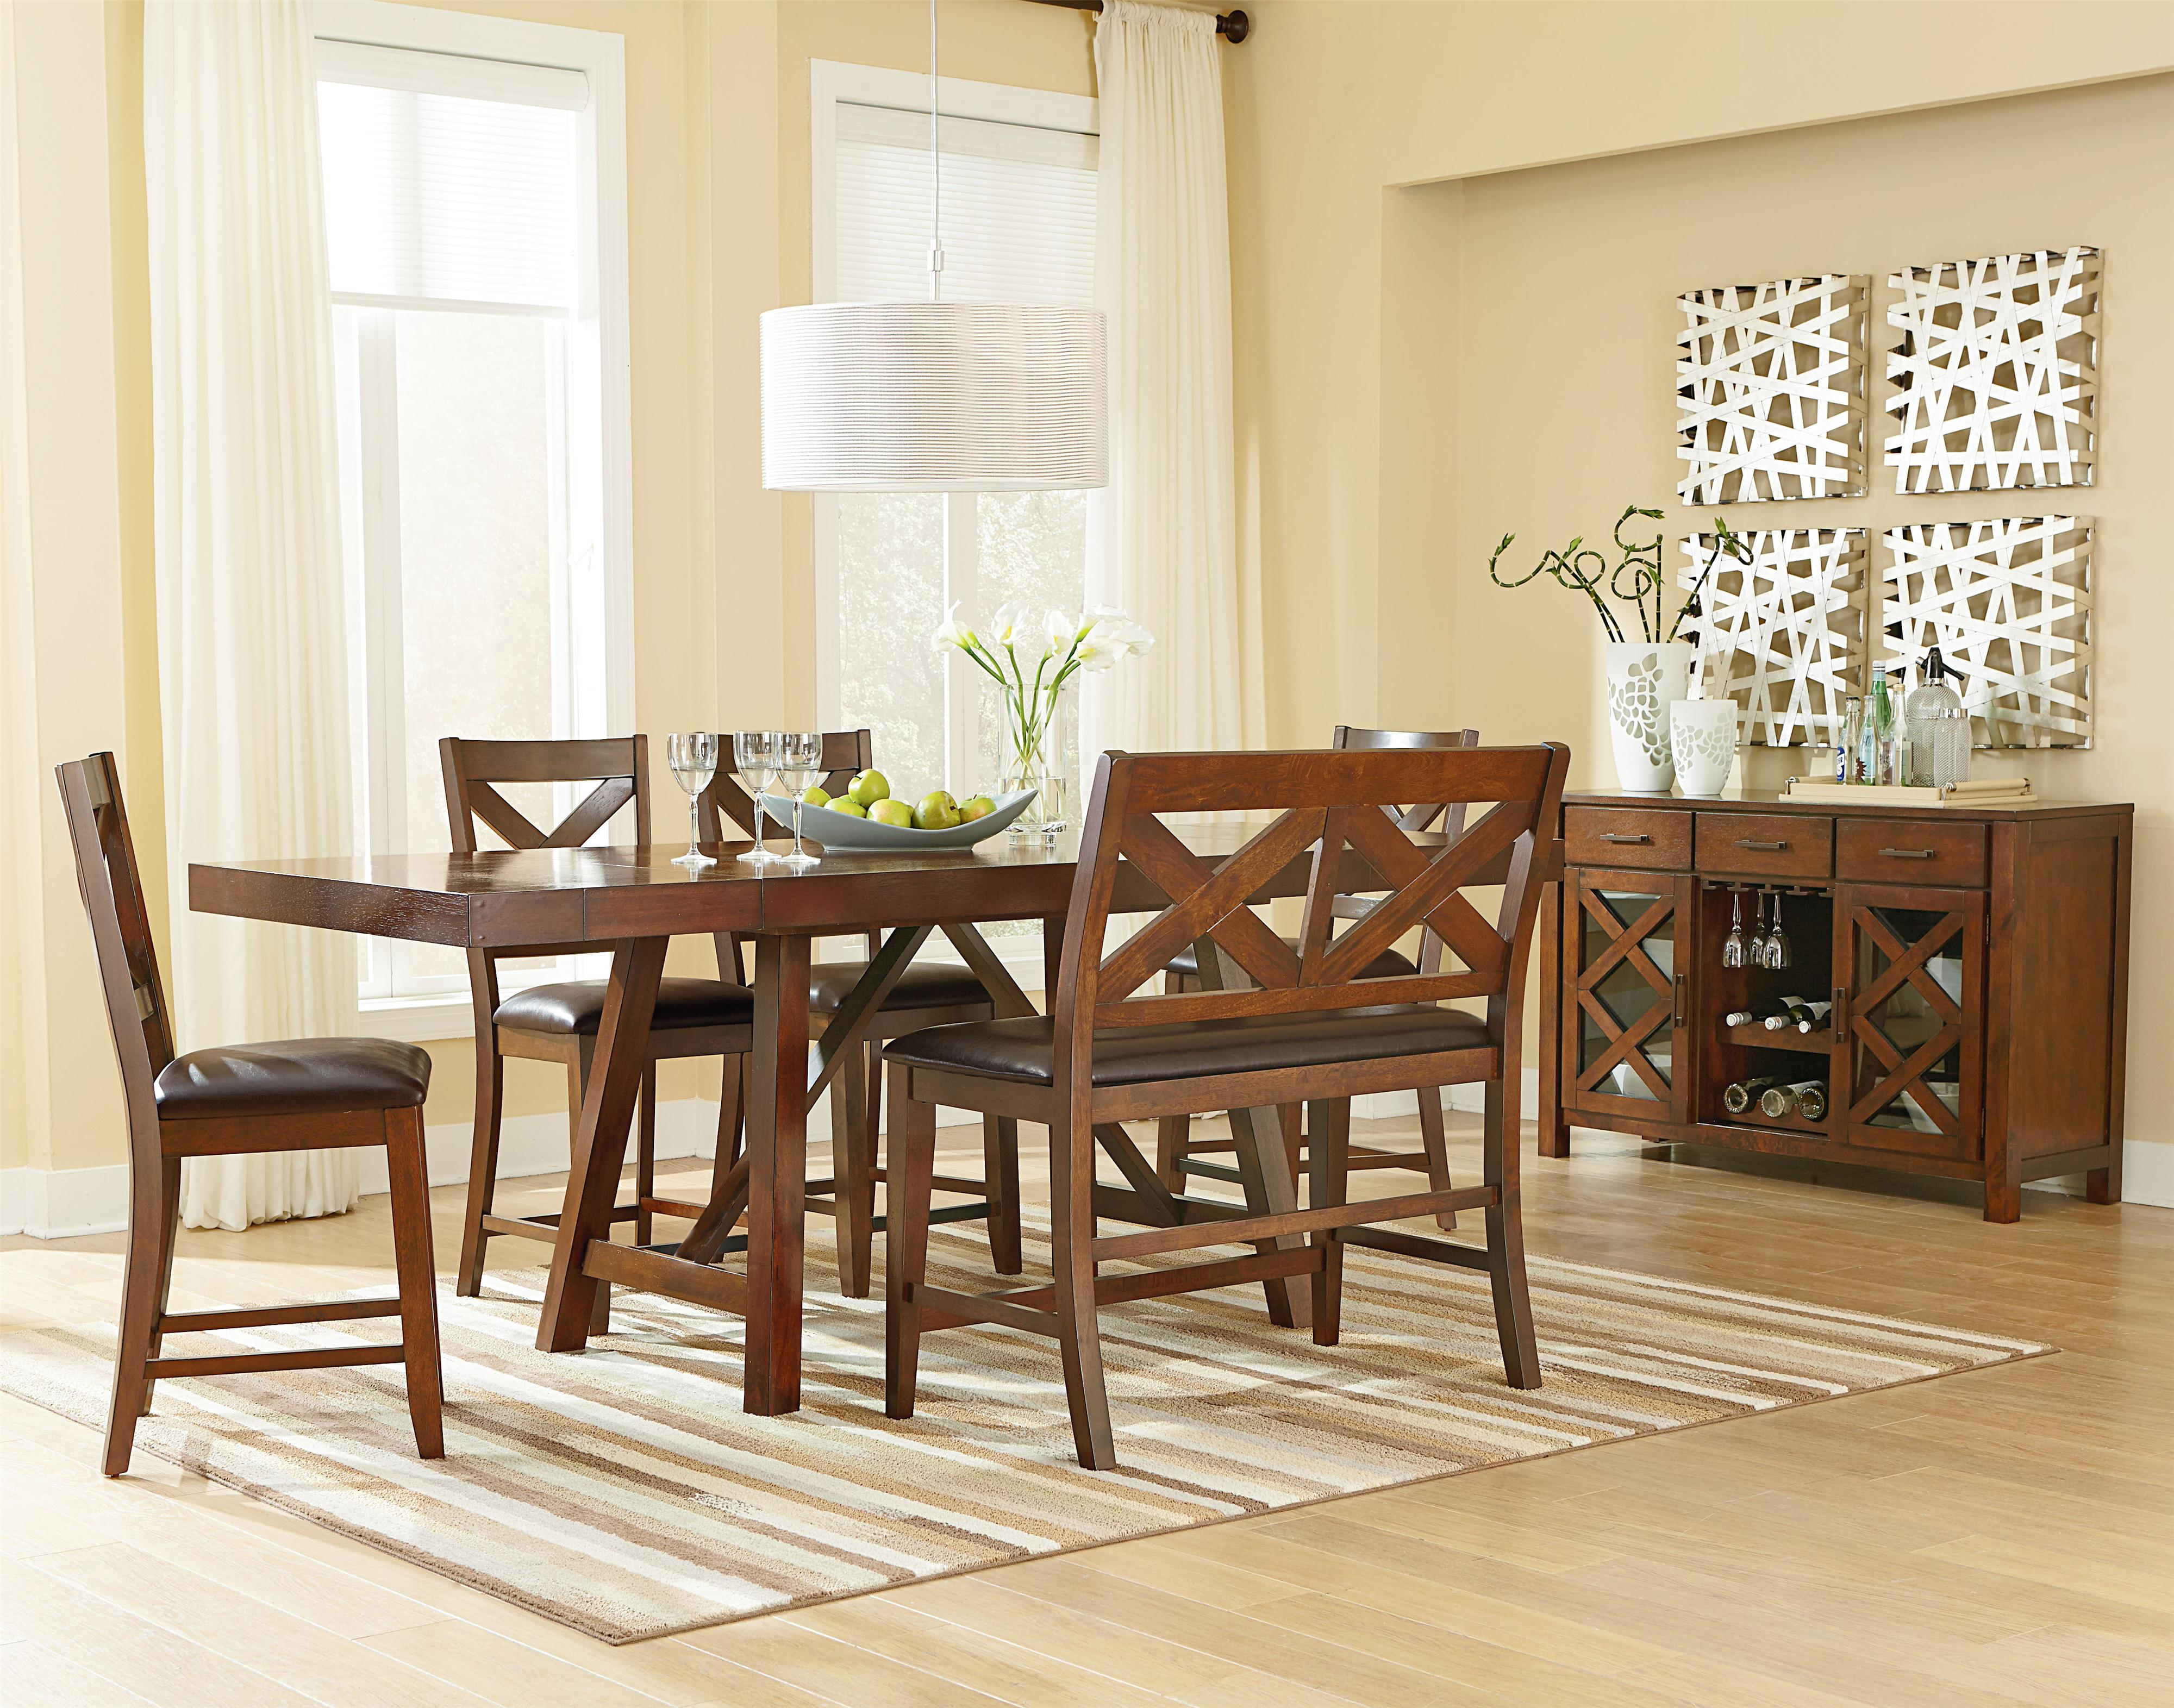 Standard Furniture Omaha Brown 16194 Counter Height Bar